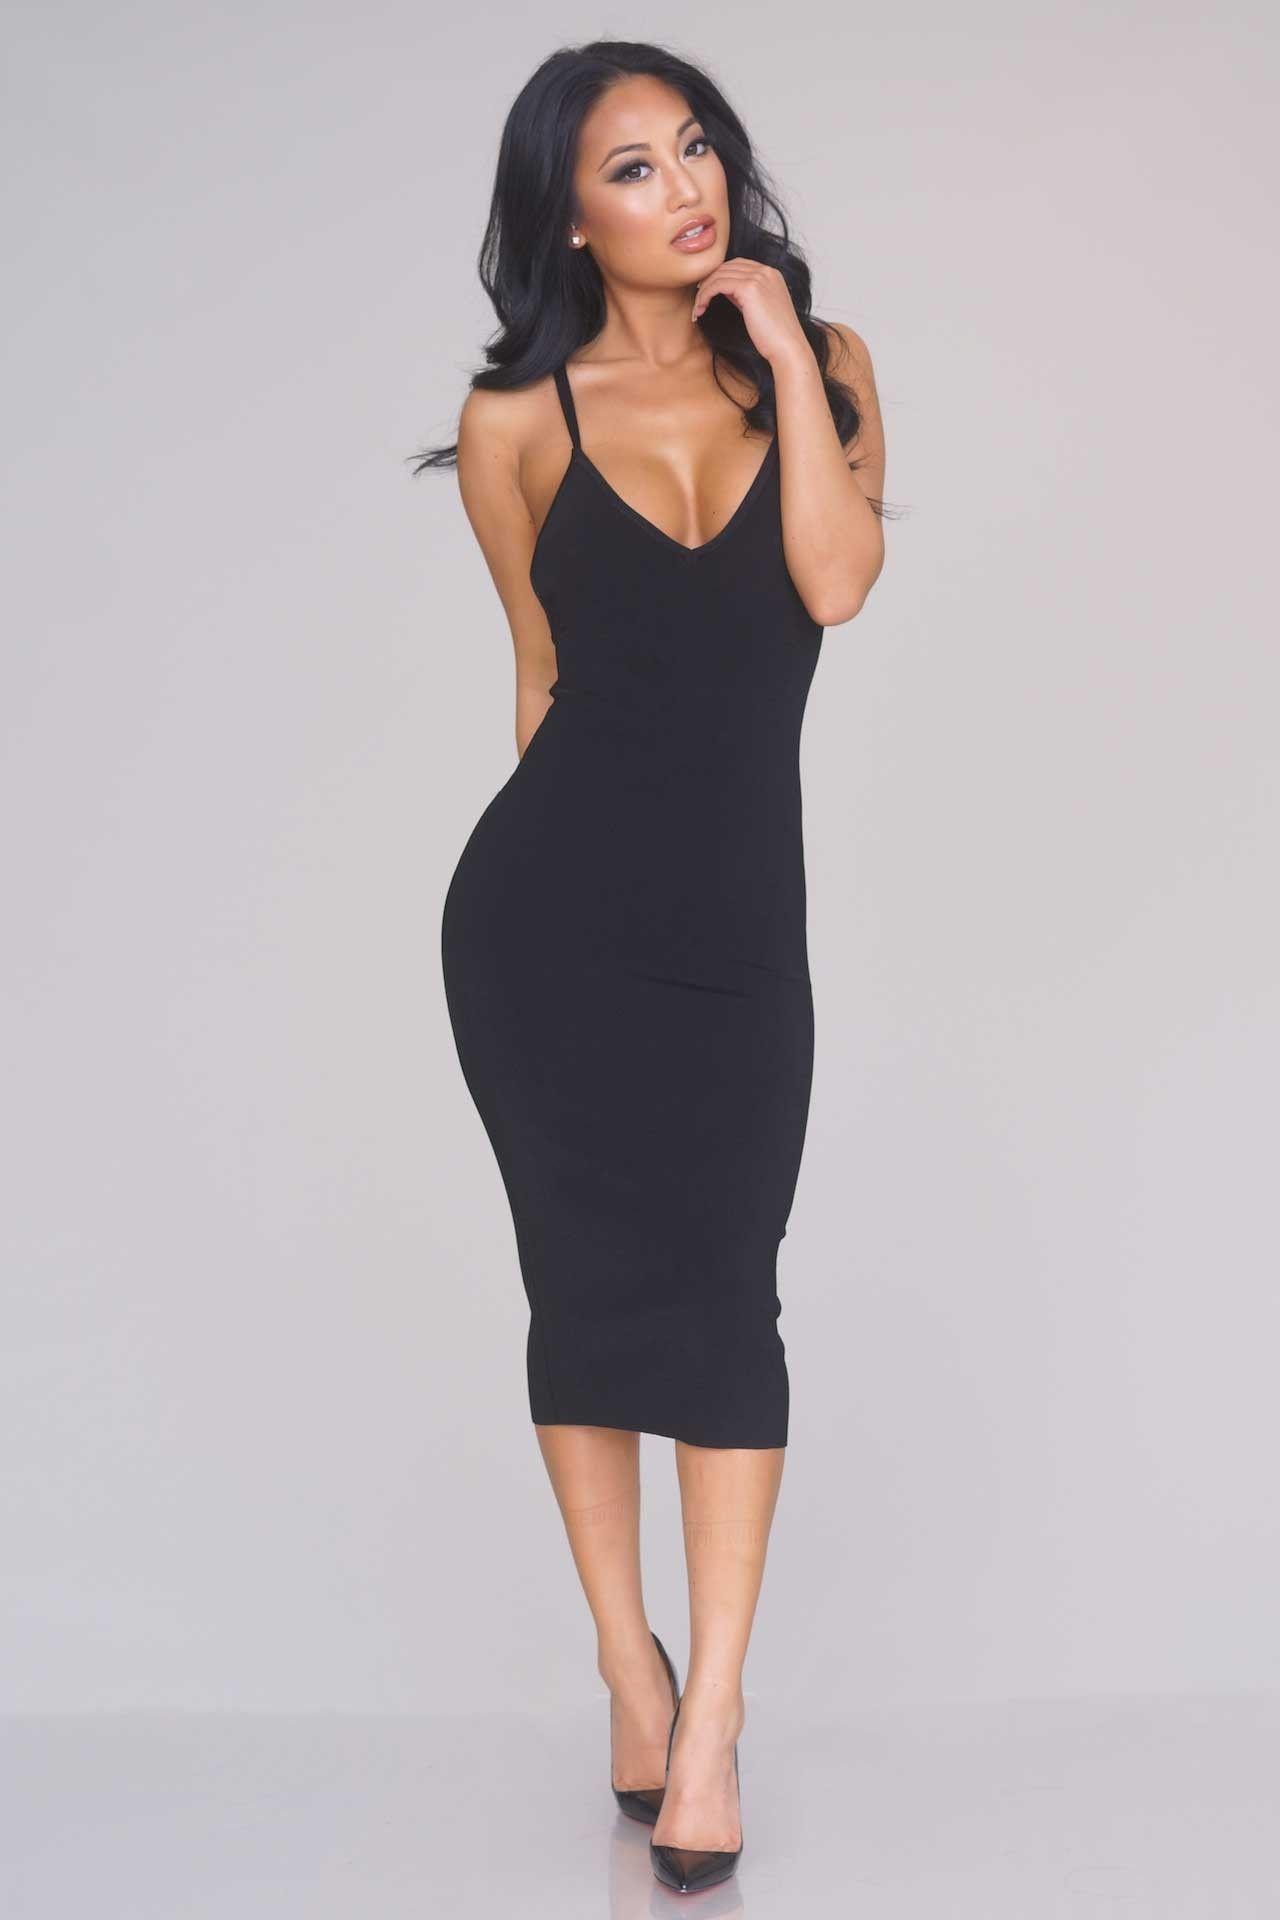 Double Strap Knit Midi Dress Black Fashion Dresses Beautiful Dresses [ 1920 x 1280 Pixel ]